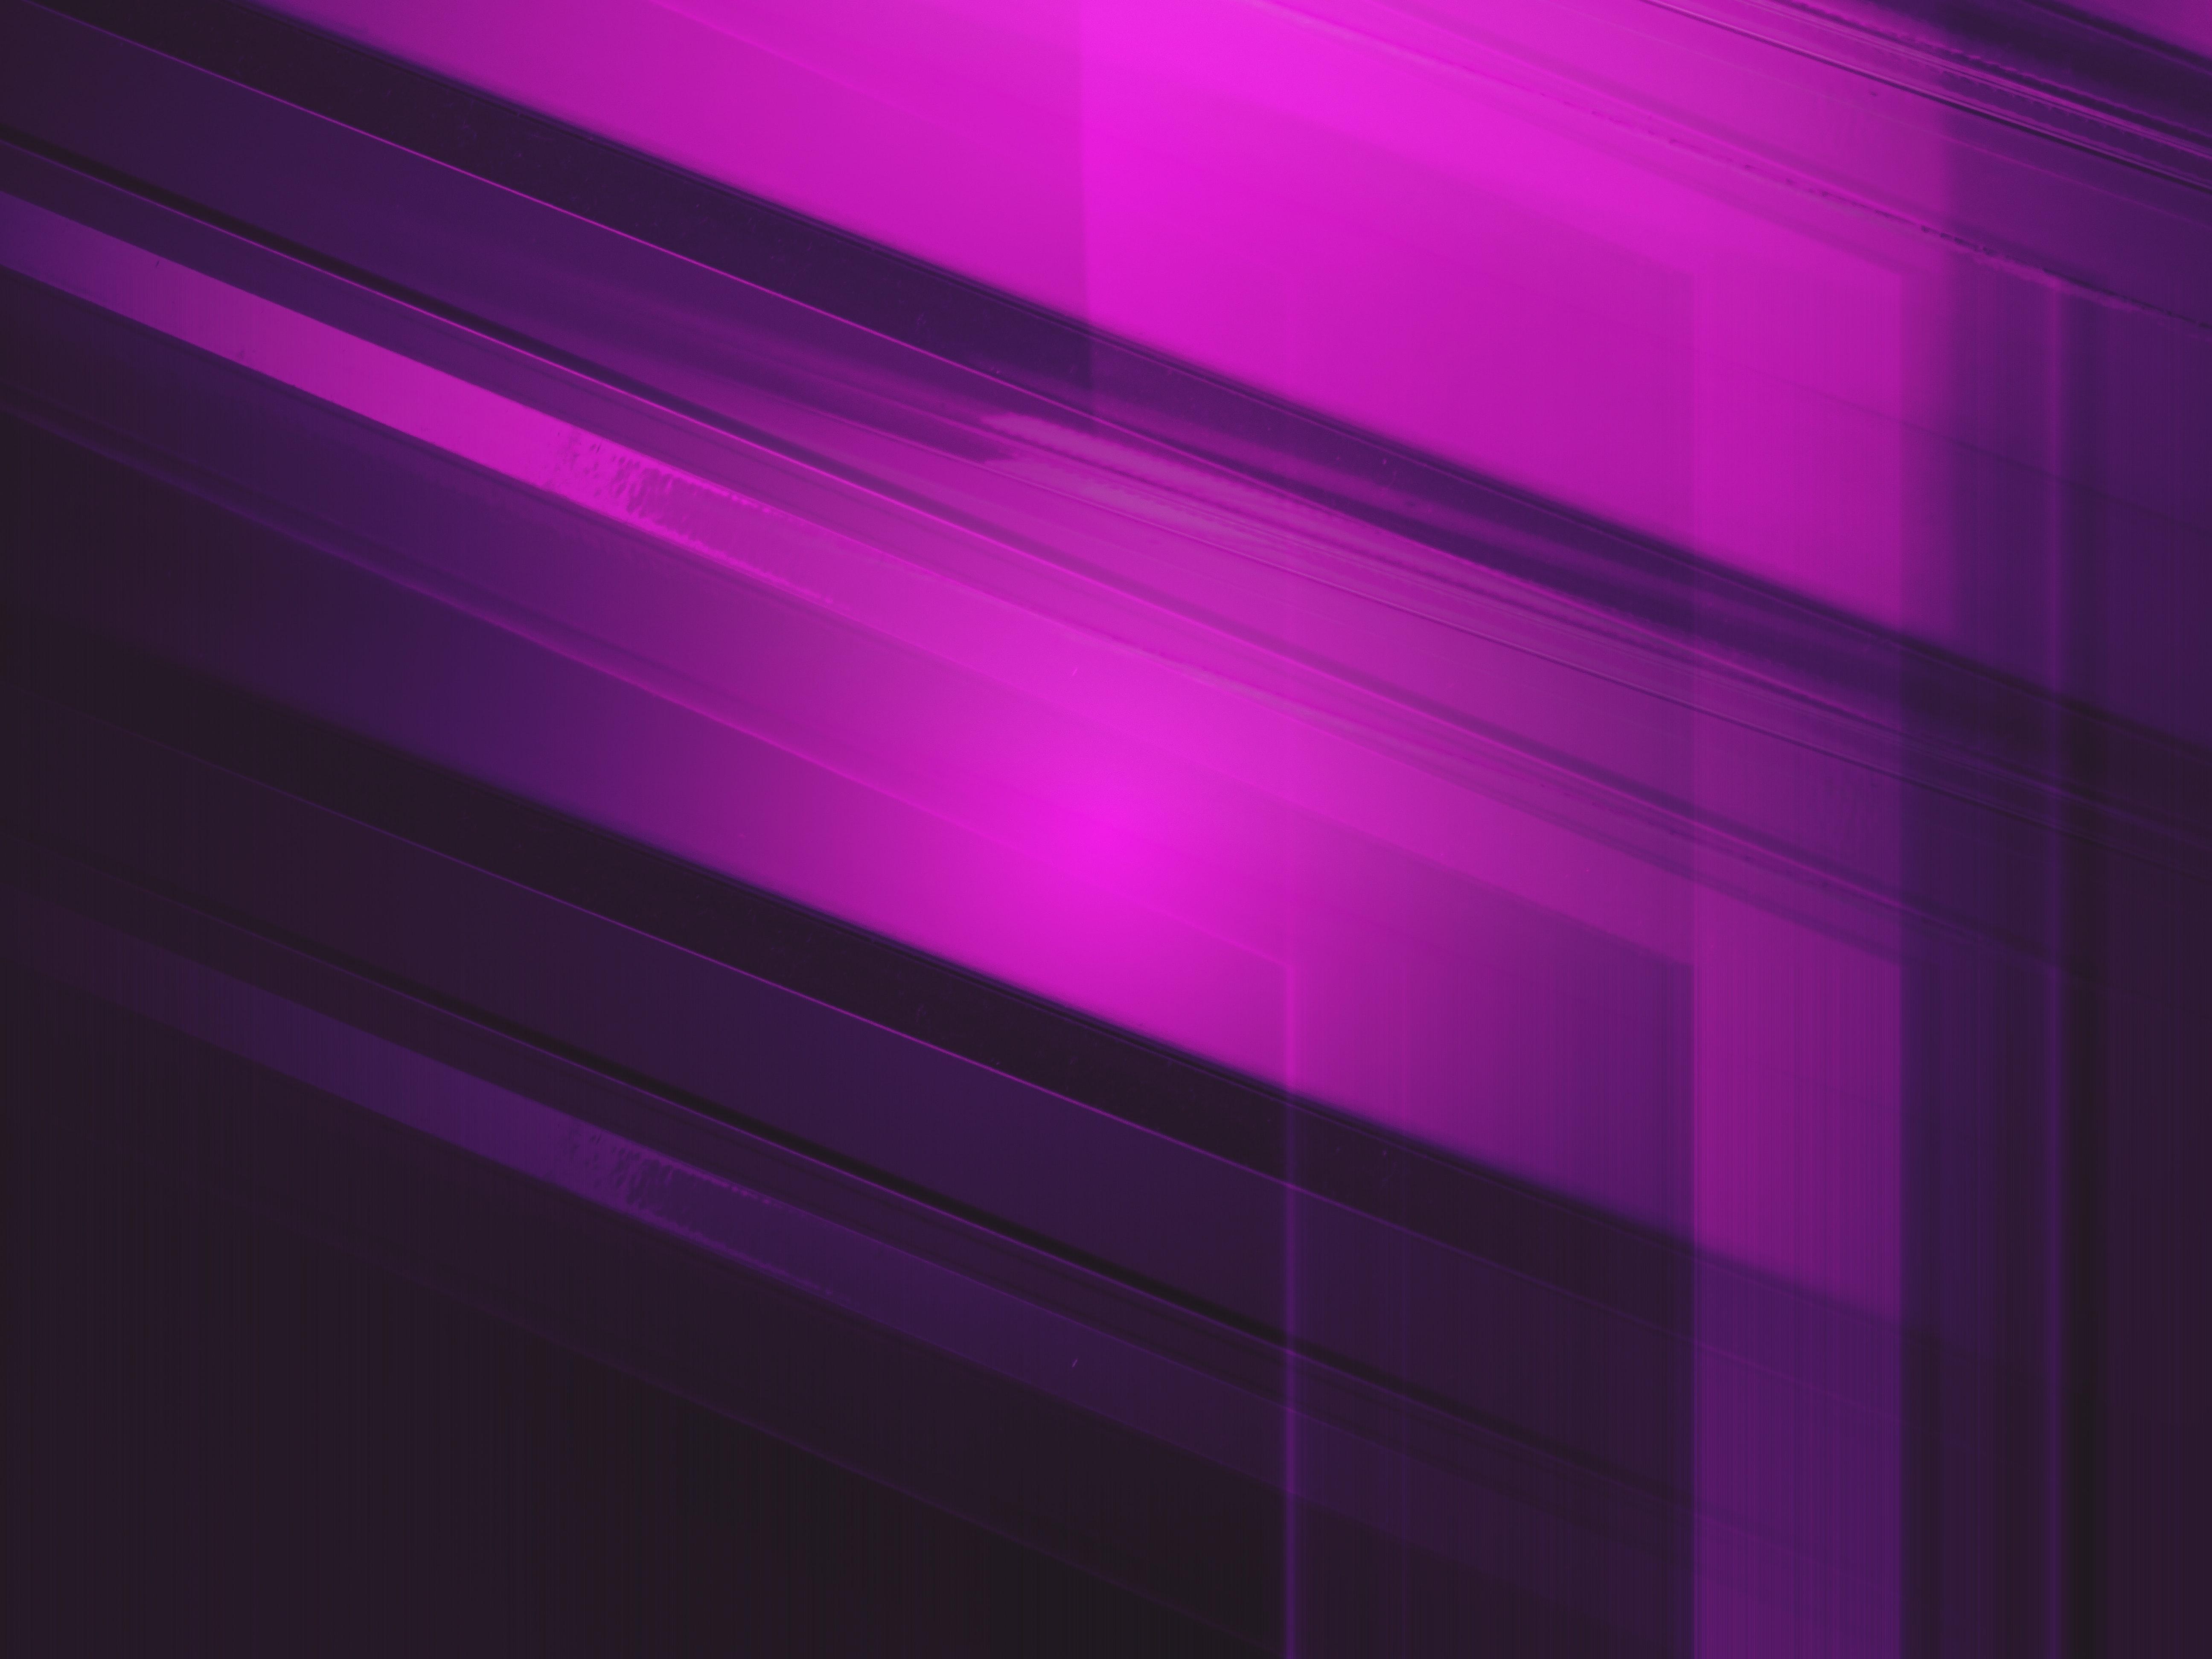 purple following lines 1575660125 - Purple Following Lines -